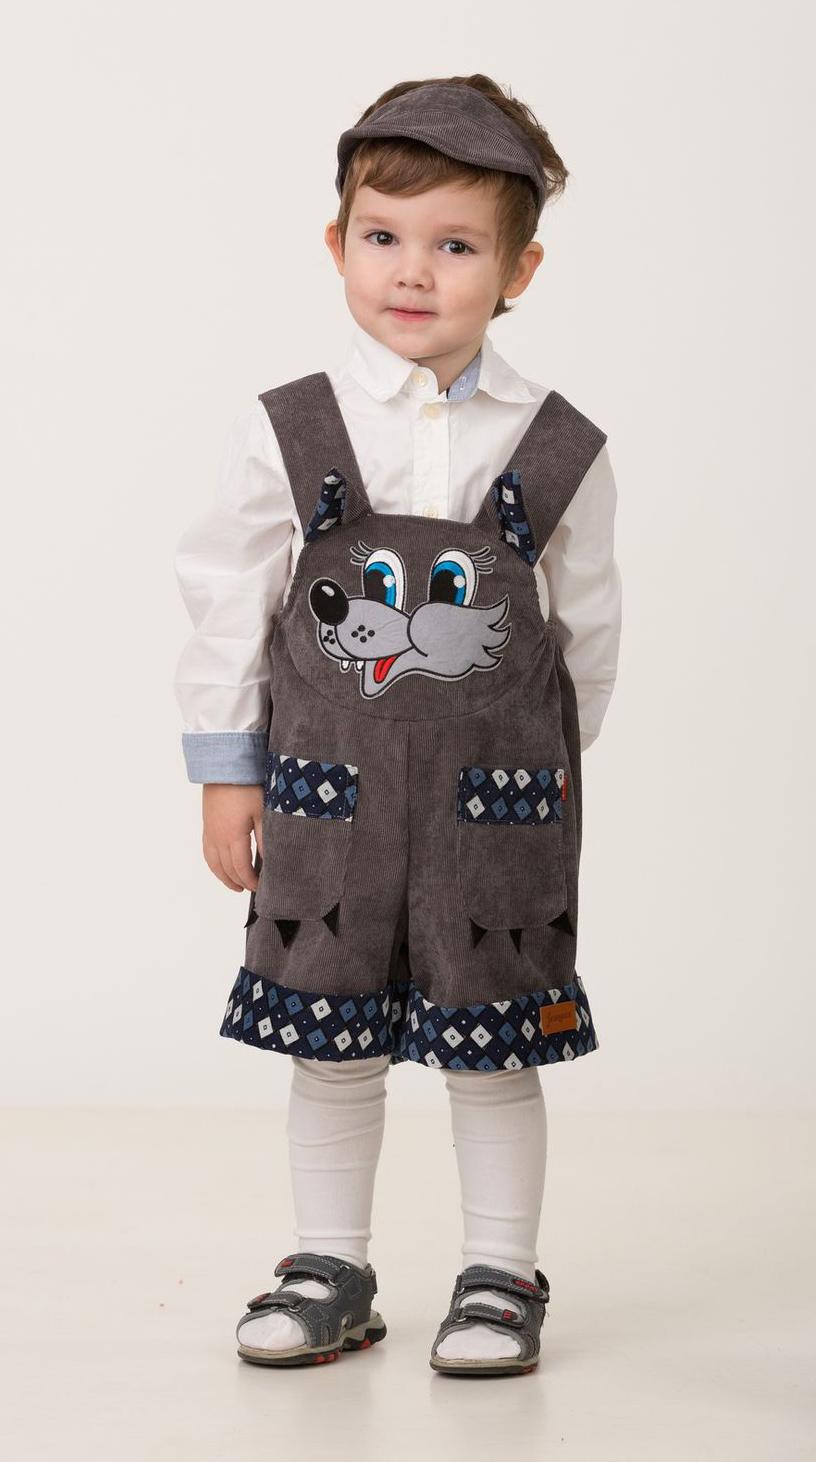 Карнавальный костюм Jeanees Волчонок Крепыш, цвет: тёмно-серый. Размер: 30 карнавальный костюм jeanees мышонок масик цвет серый размер 24